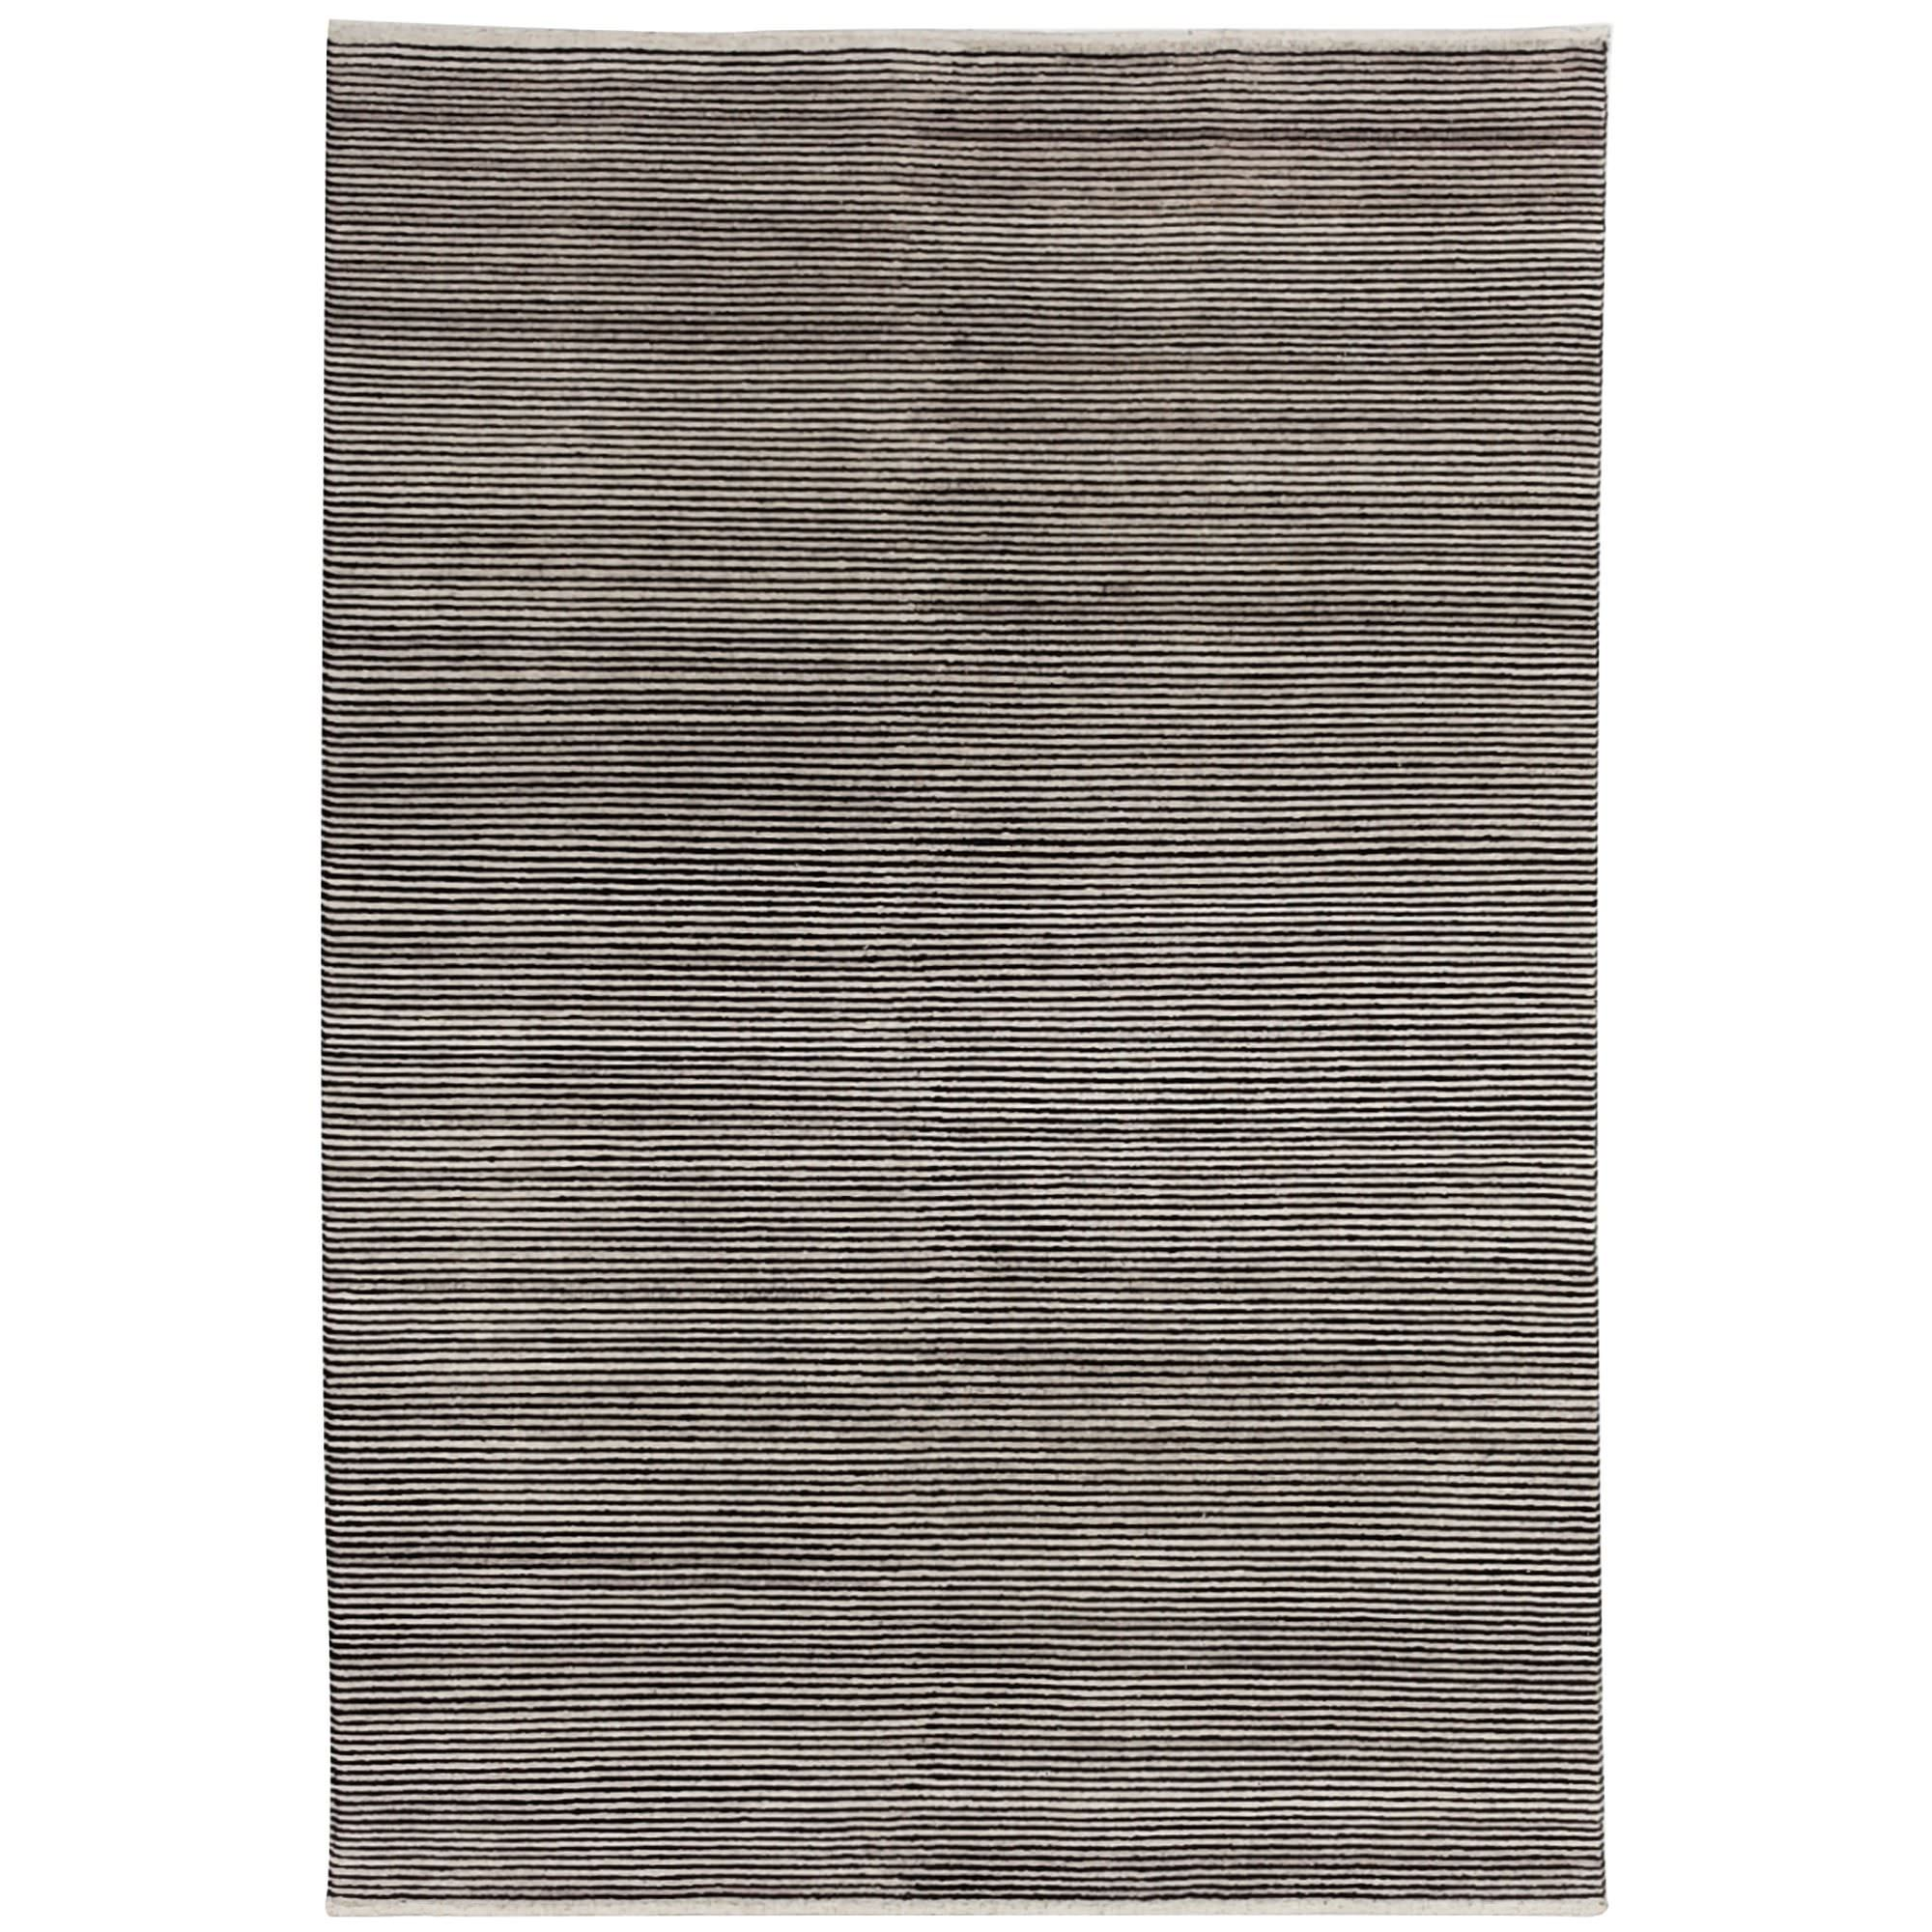 Boheme Hand Tufted Wool Rug, 250x350cm, Charcoal